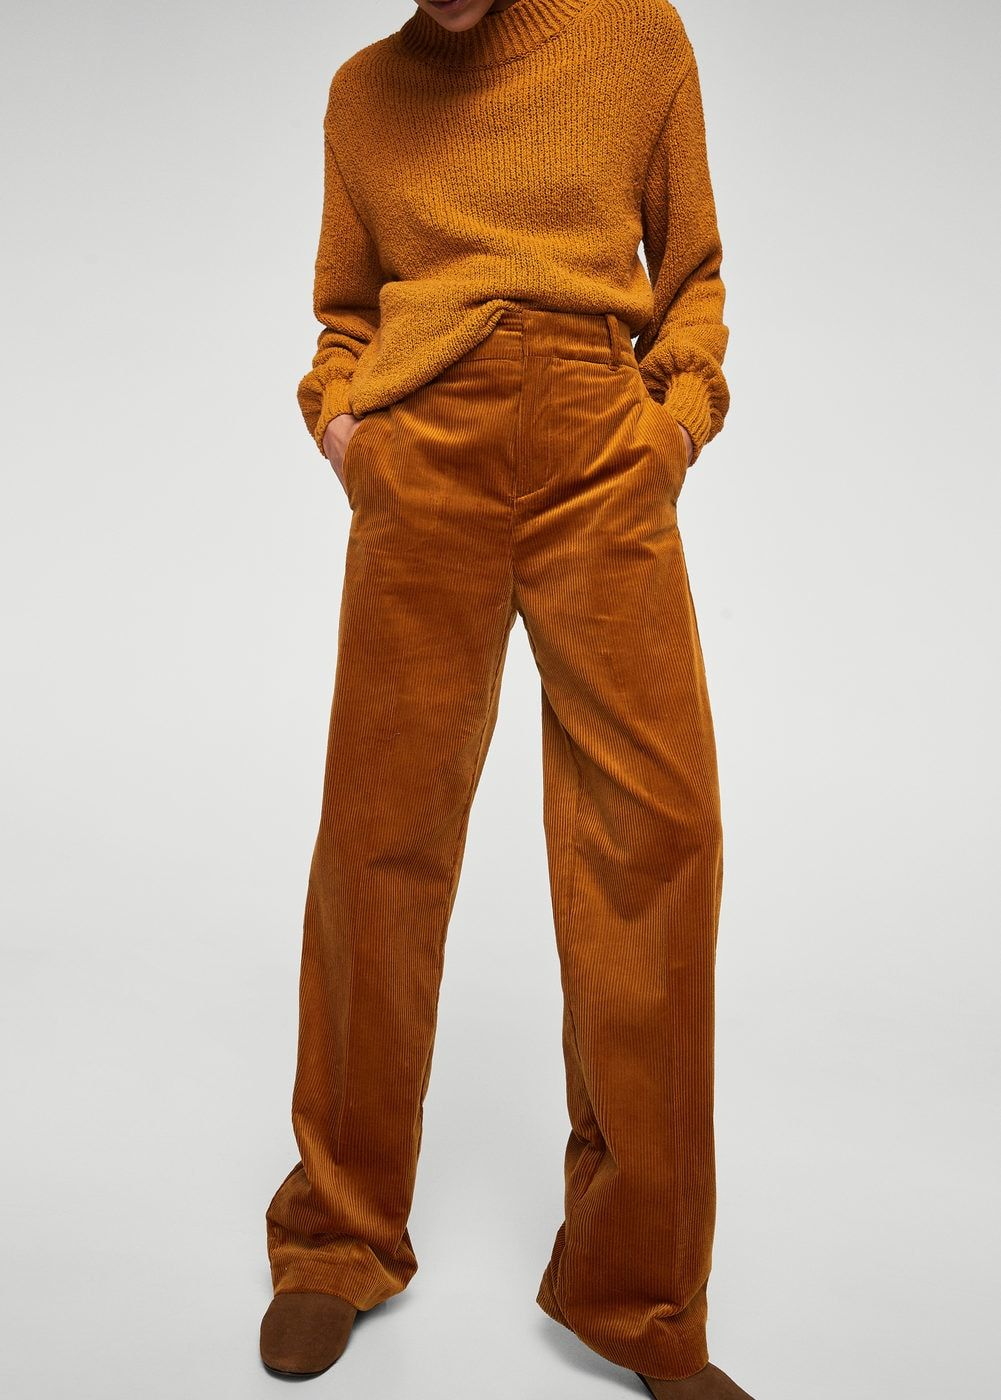 Pantalón pana tiro alto - Mujer en 2019  d23ff641d36d